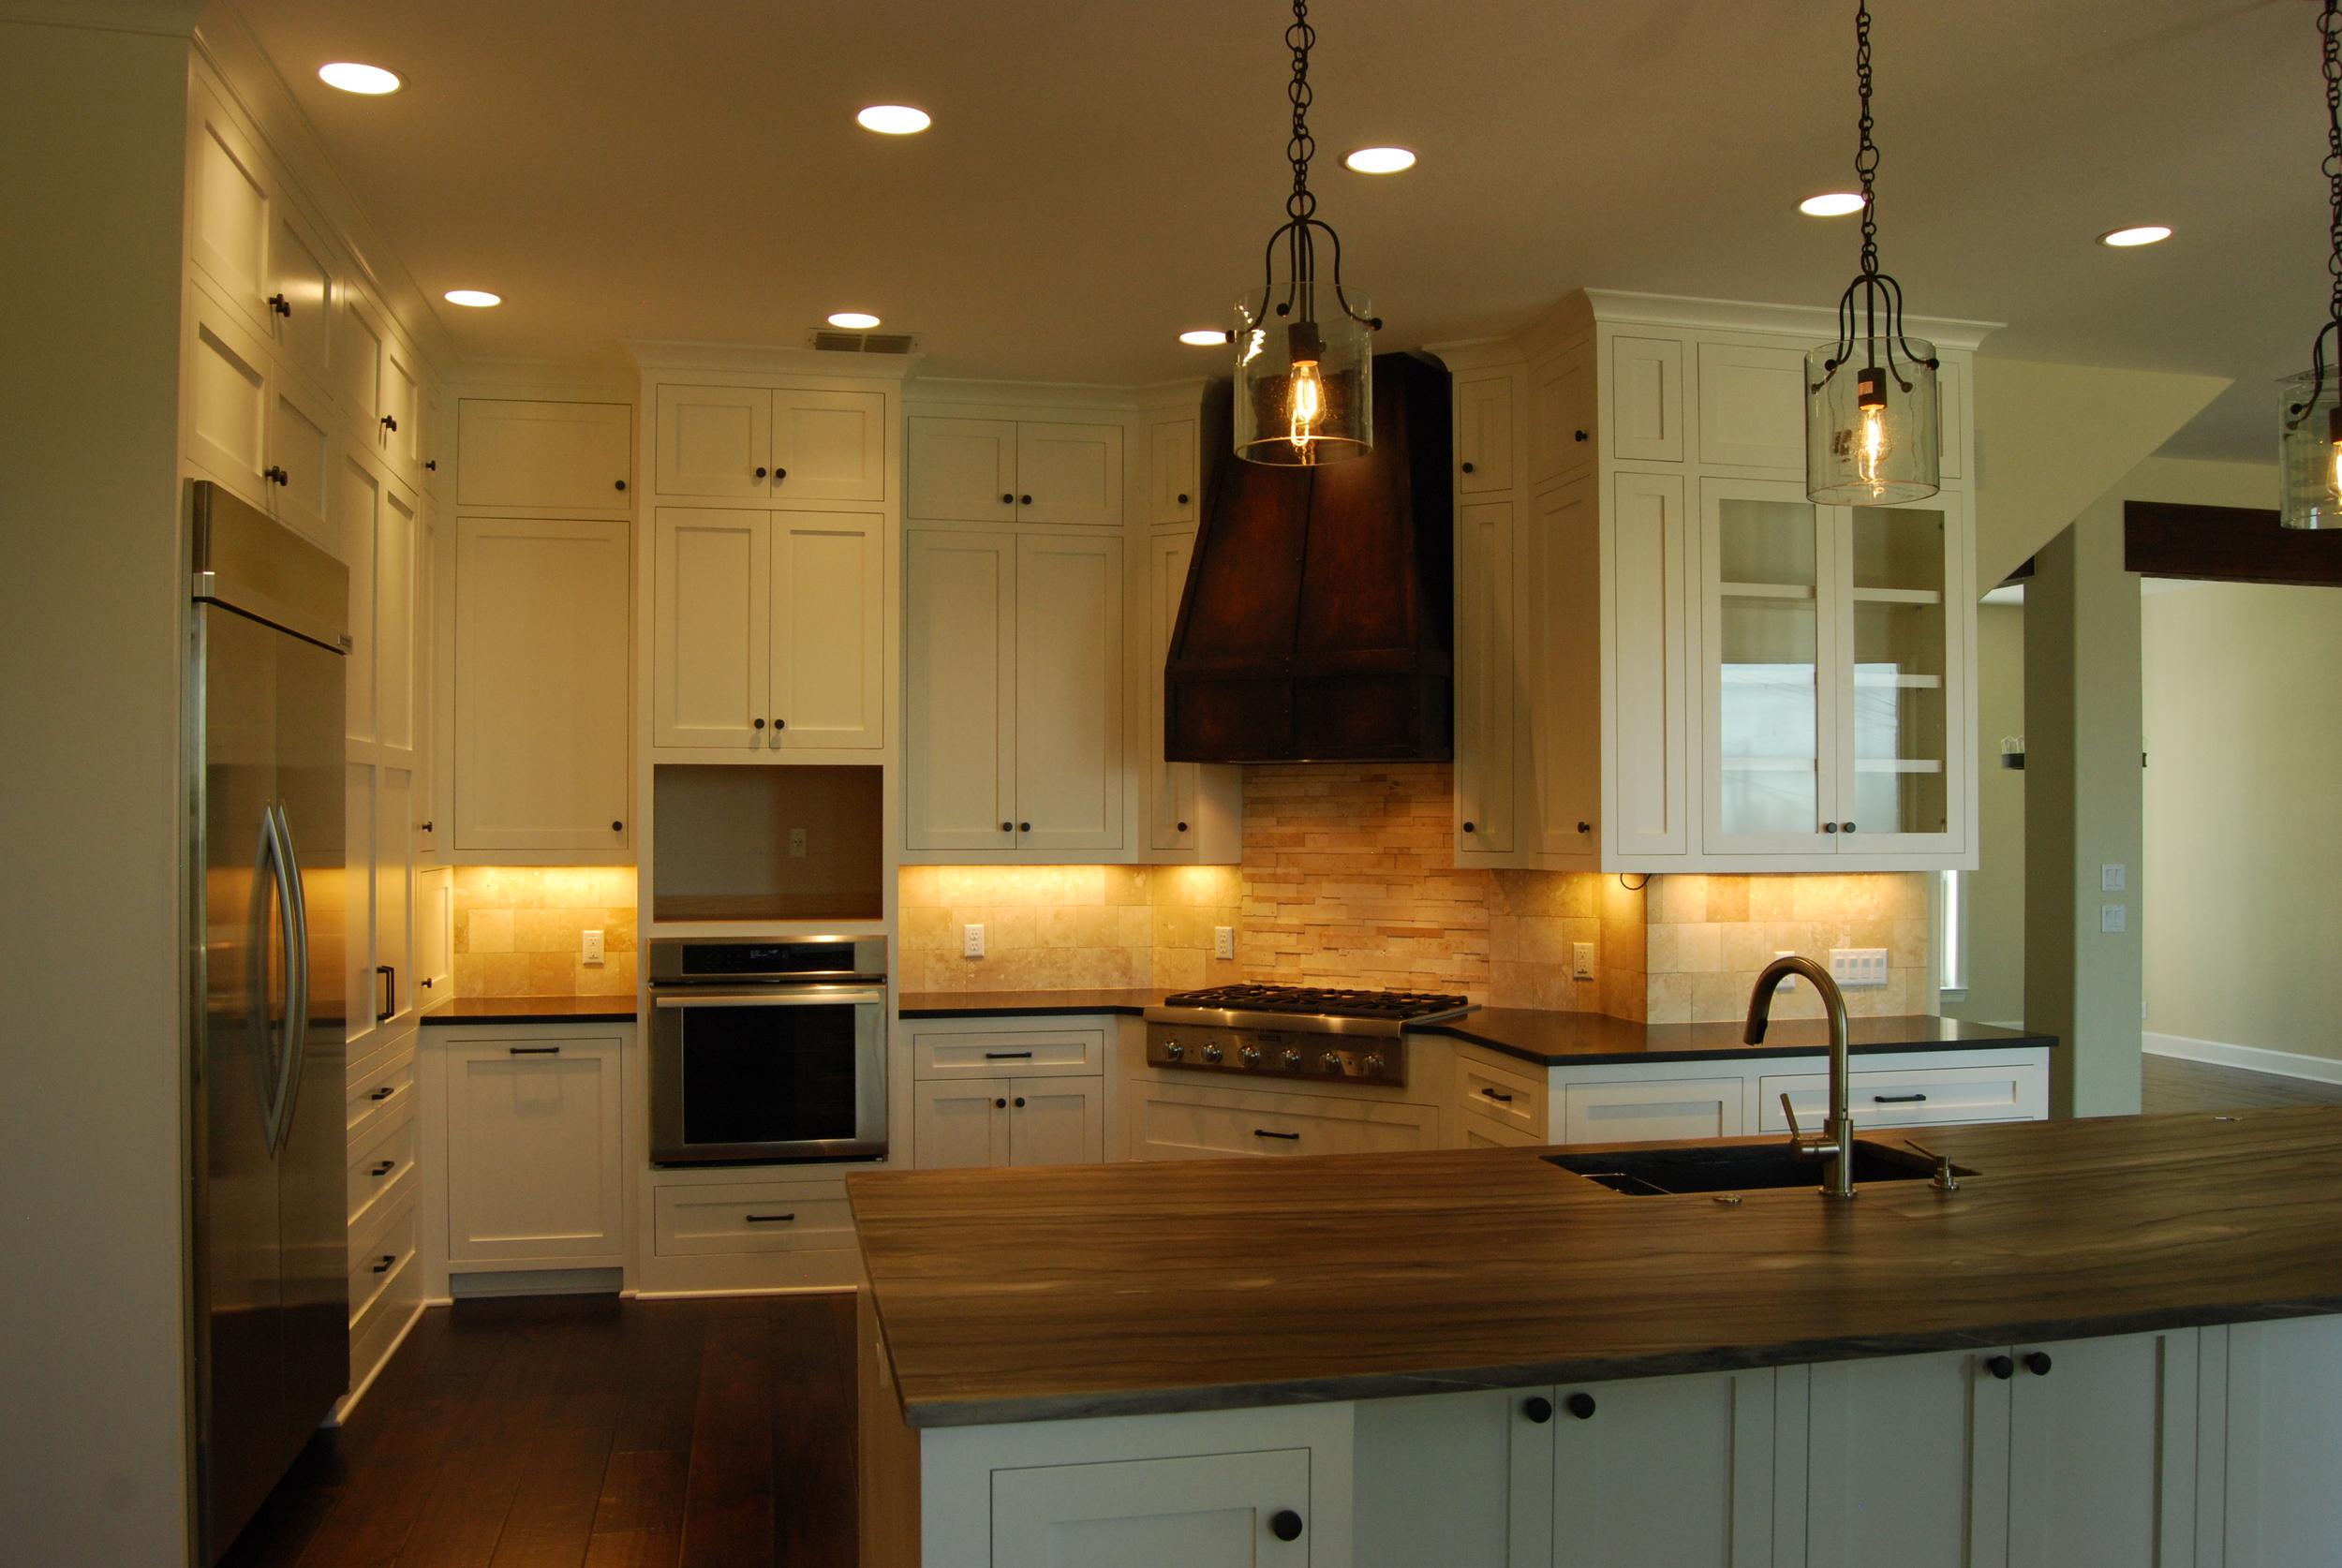 kitchens005.jpg